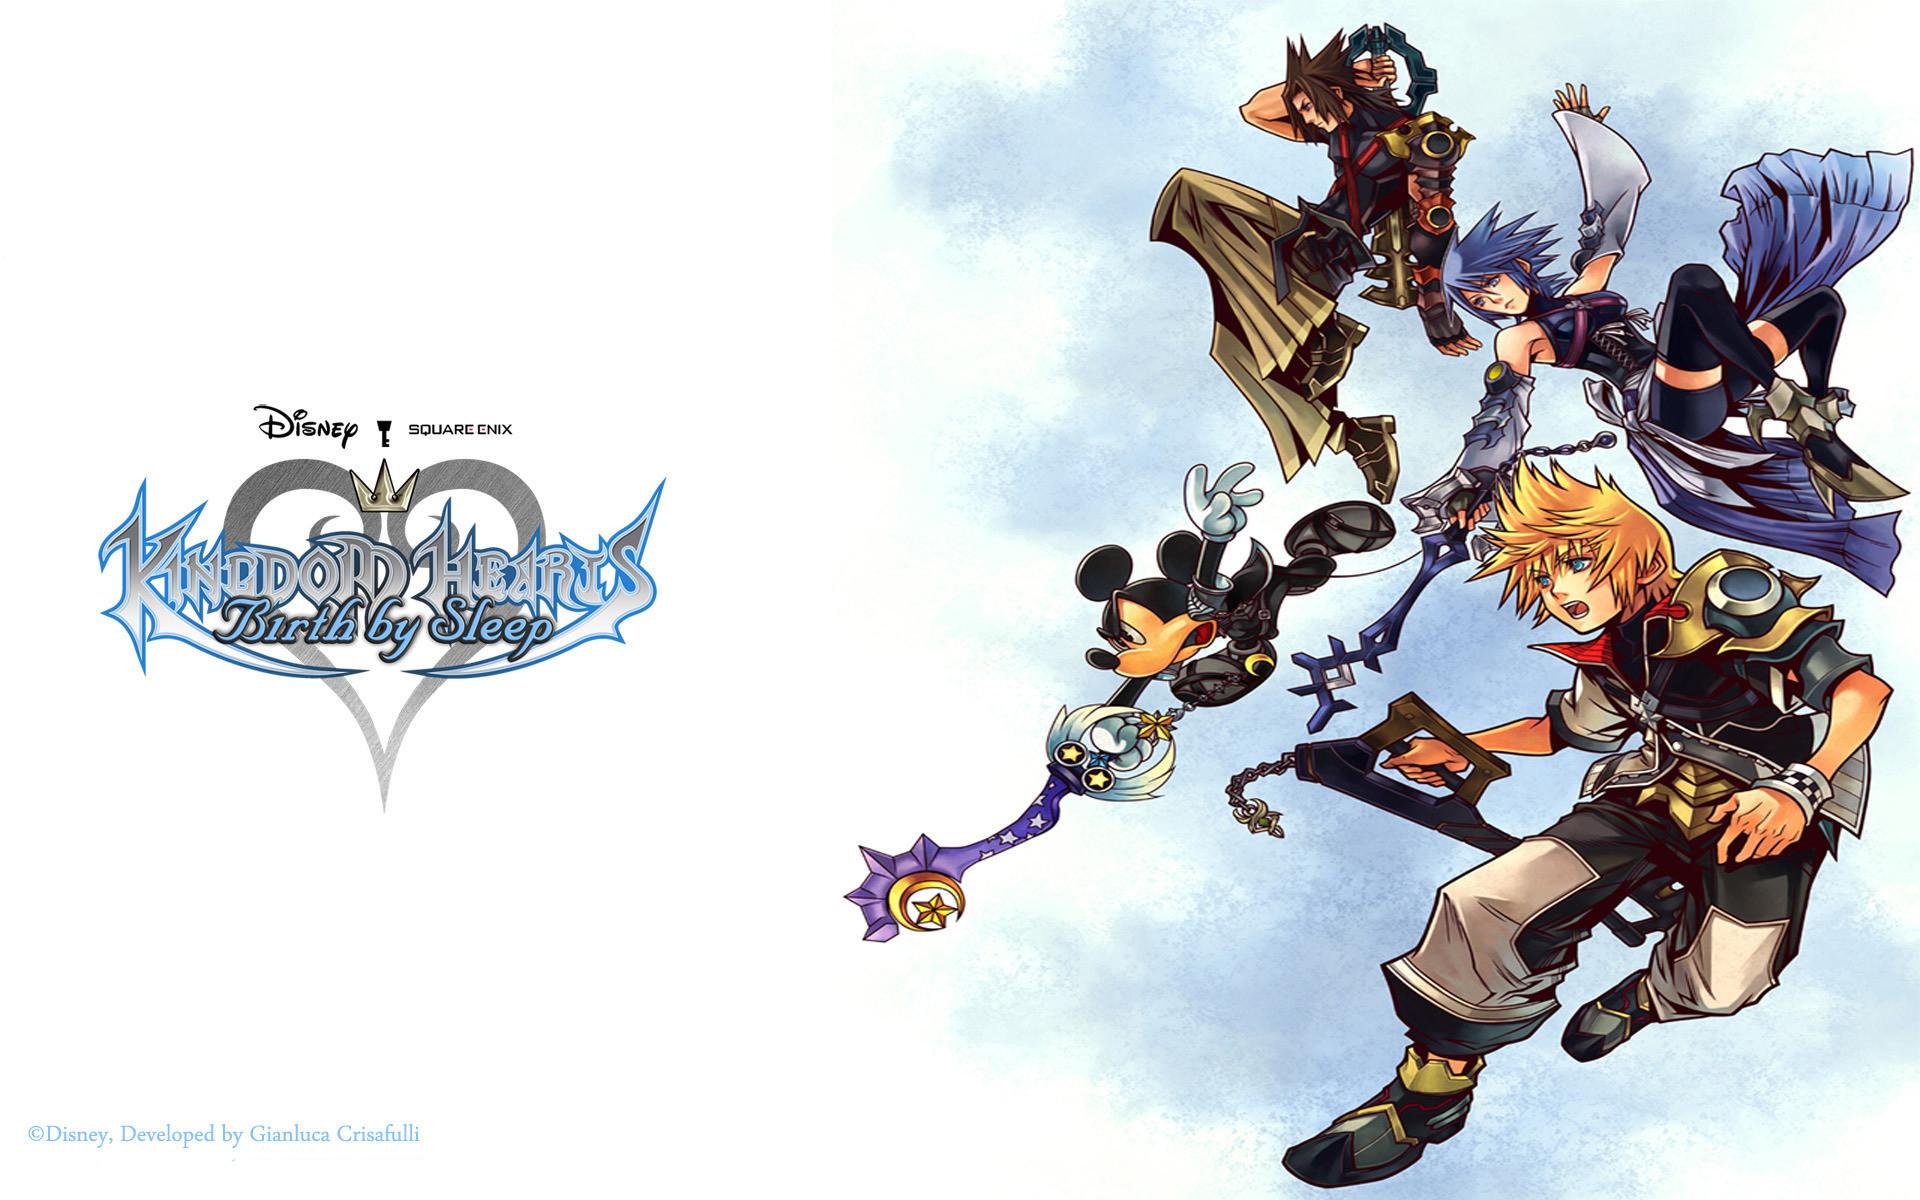 Kingdom Hearts HD Wallpaper 1920×1080 Kingdom Hearts HD Wallpaper 1920×1200